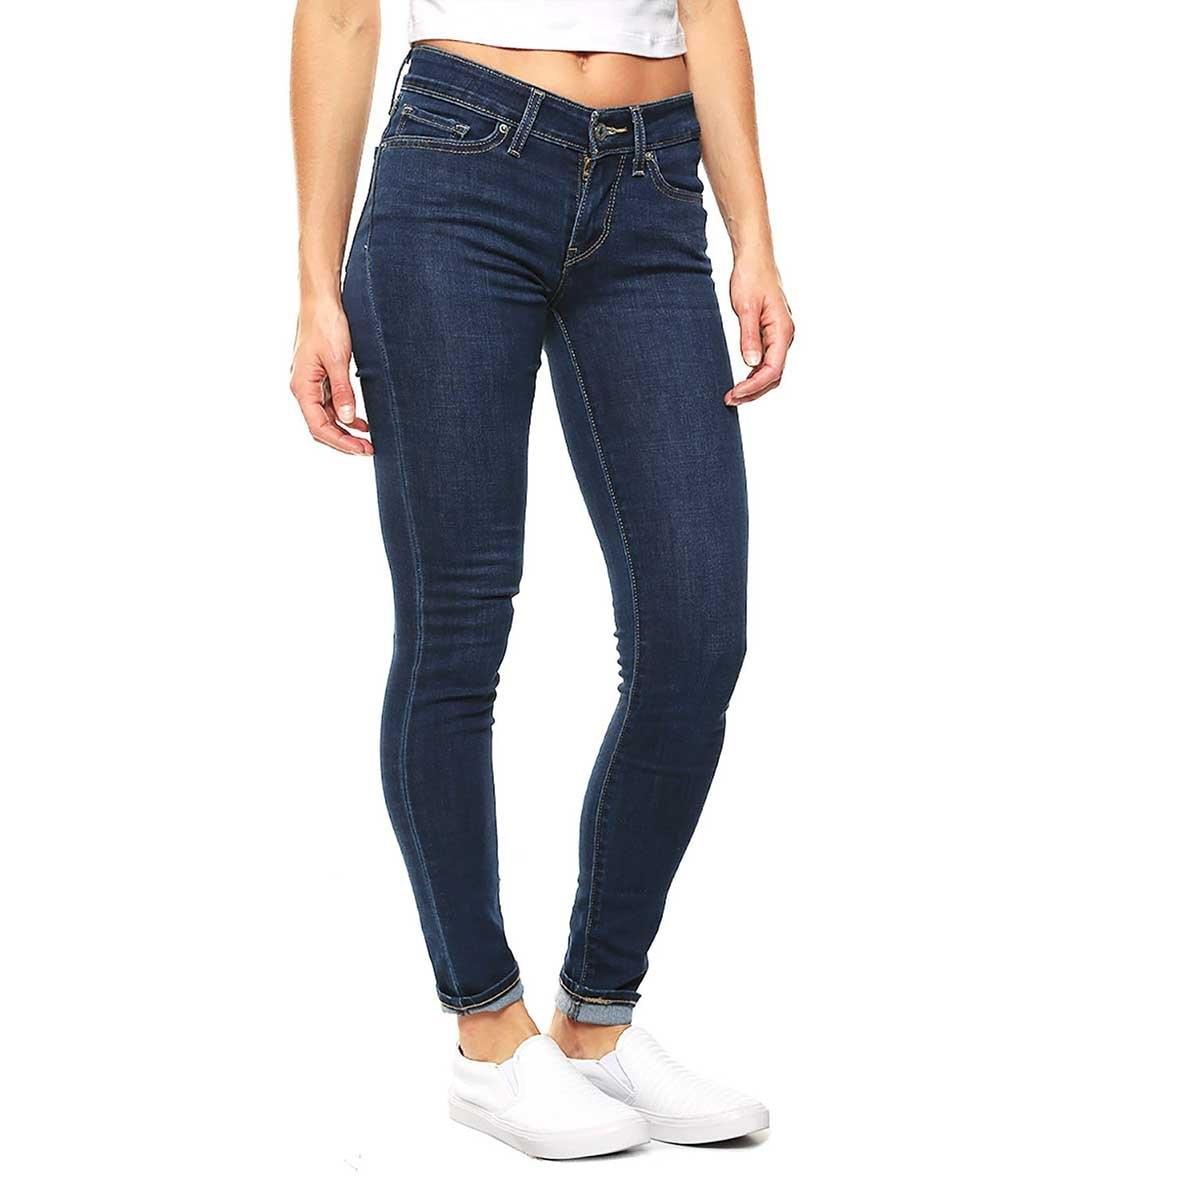 Claro Shop: Jeans 711 Skinny Levi's DAMA